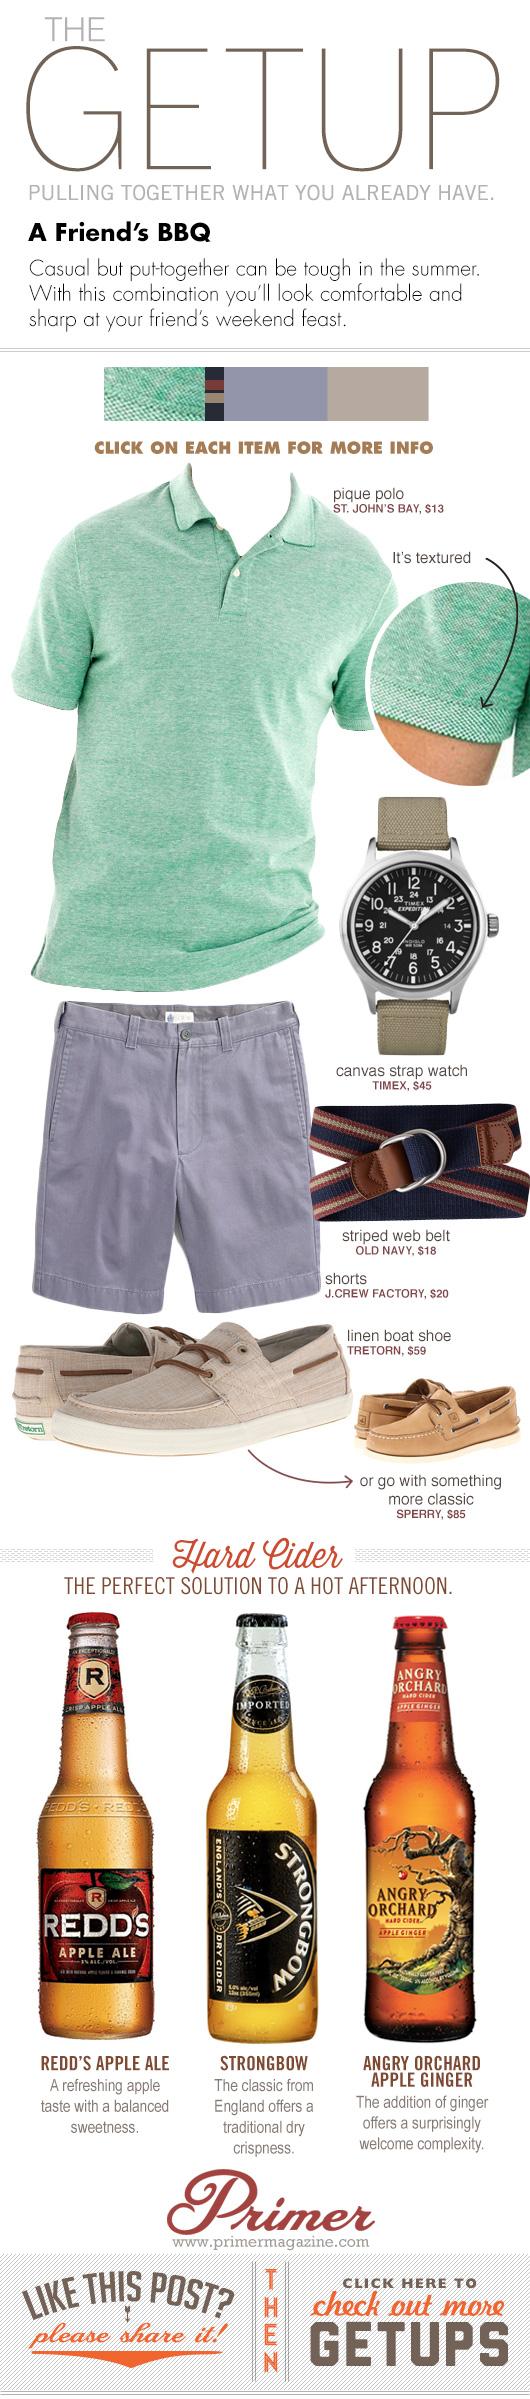 Getup A Friend\'s BBQ - Green polo, blue shorts, tan boat shoes